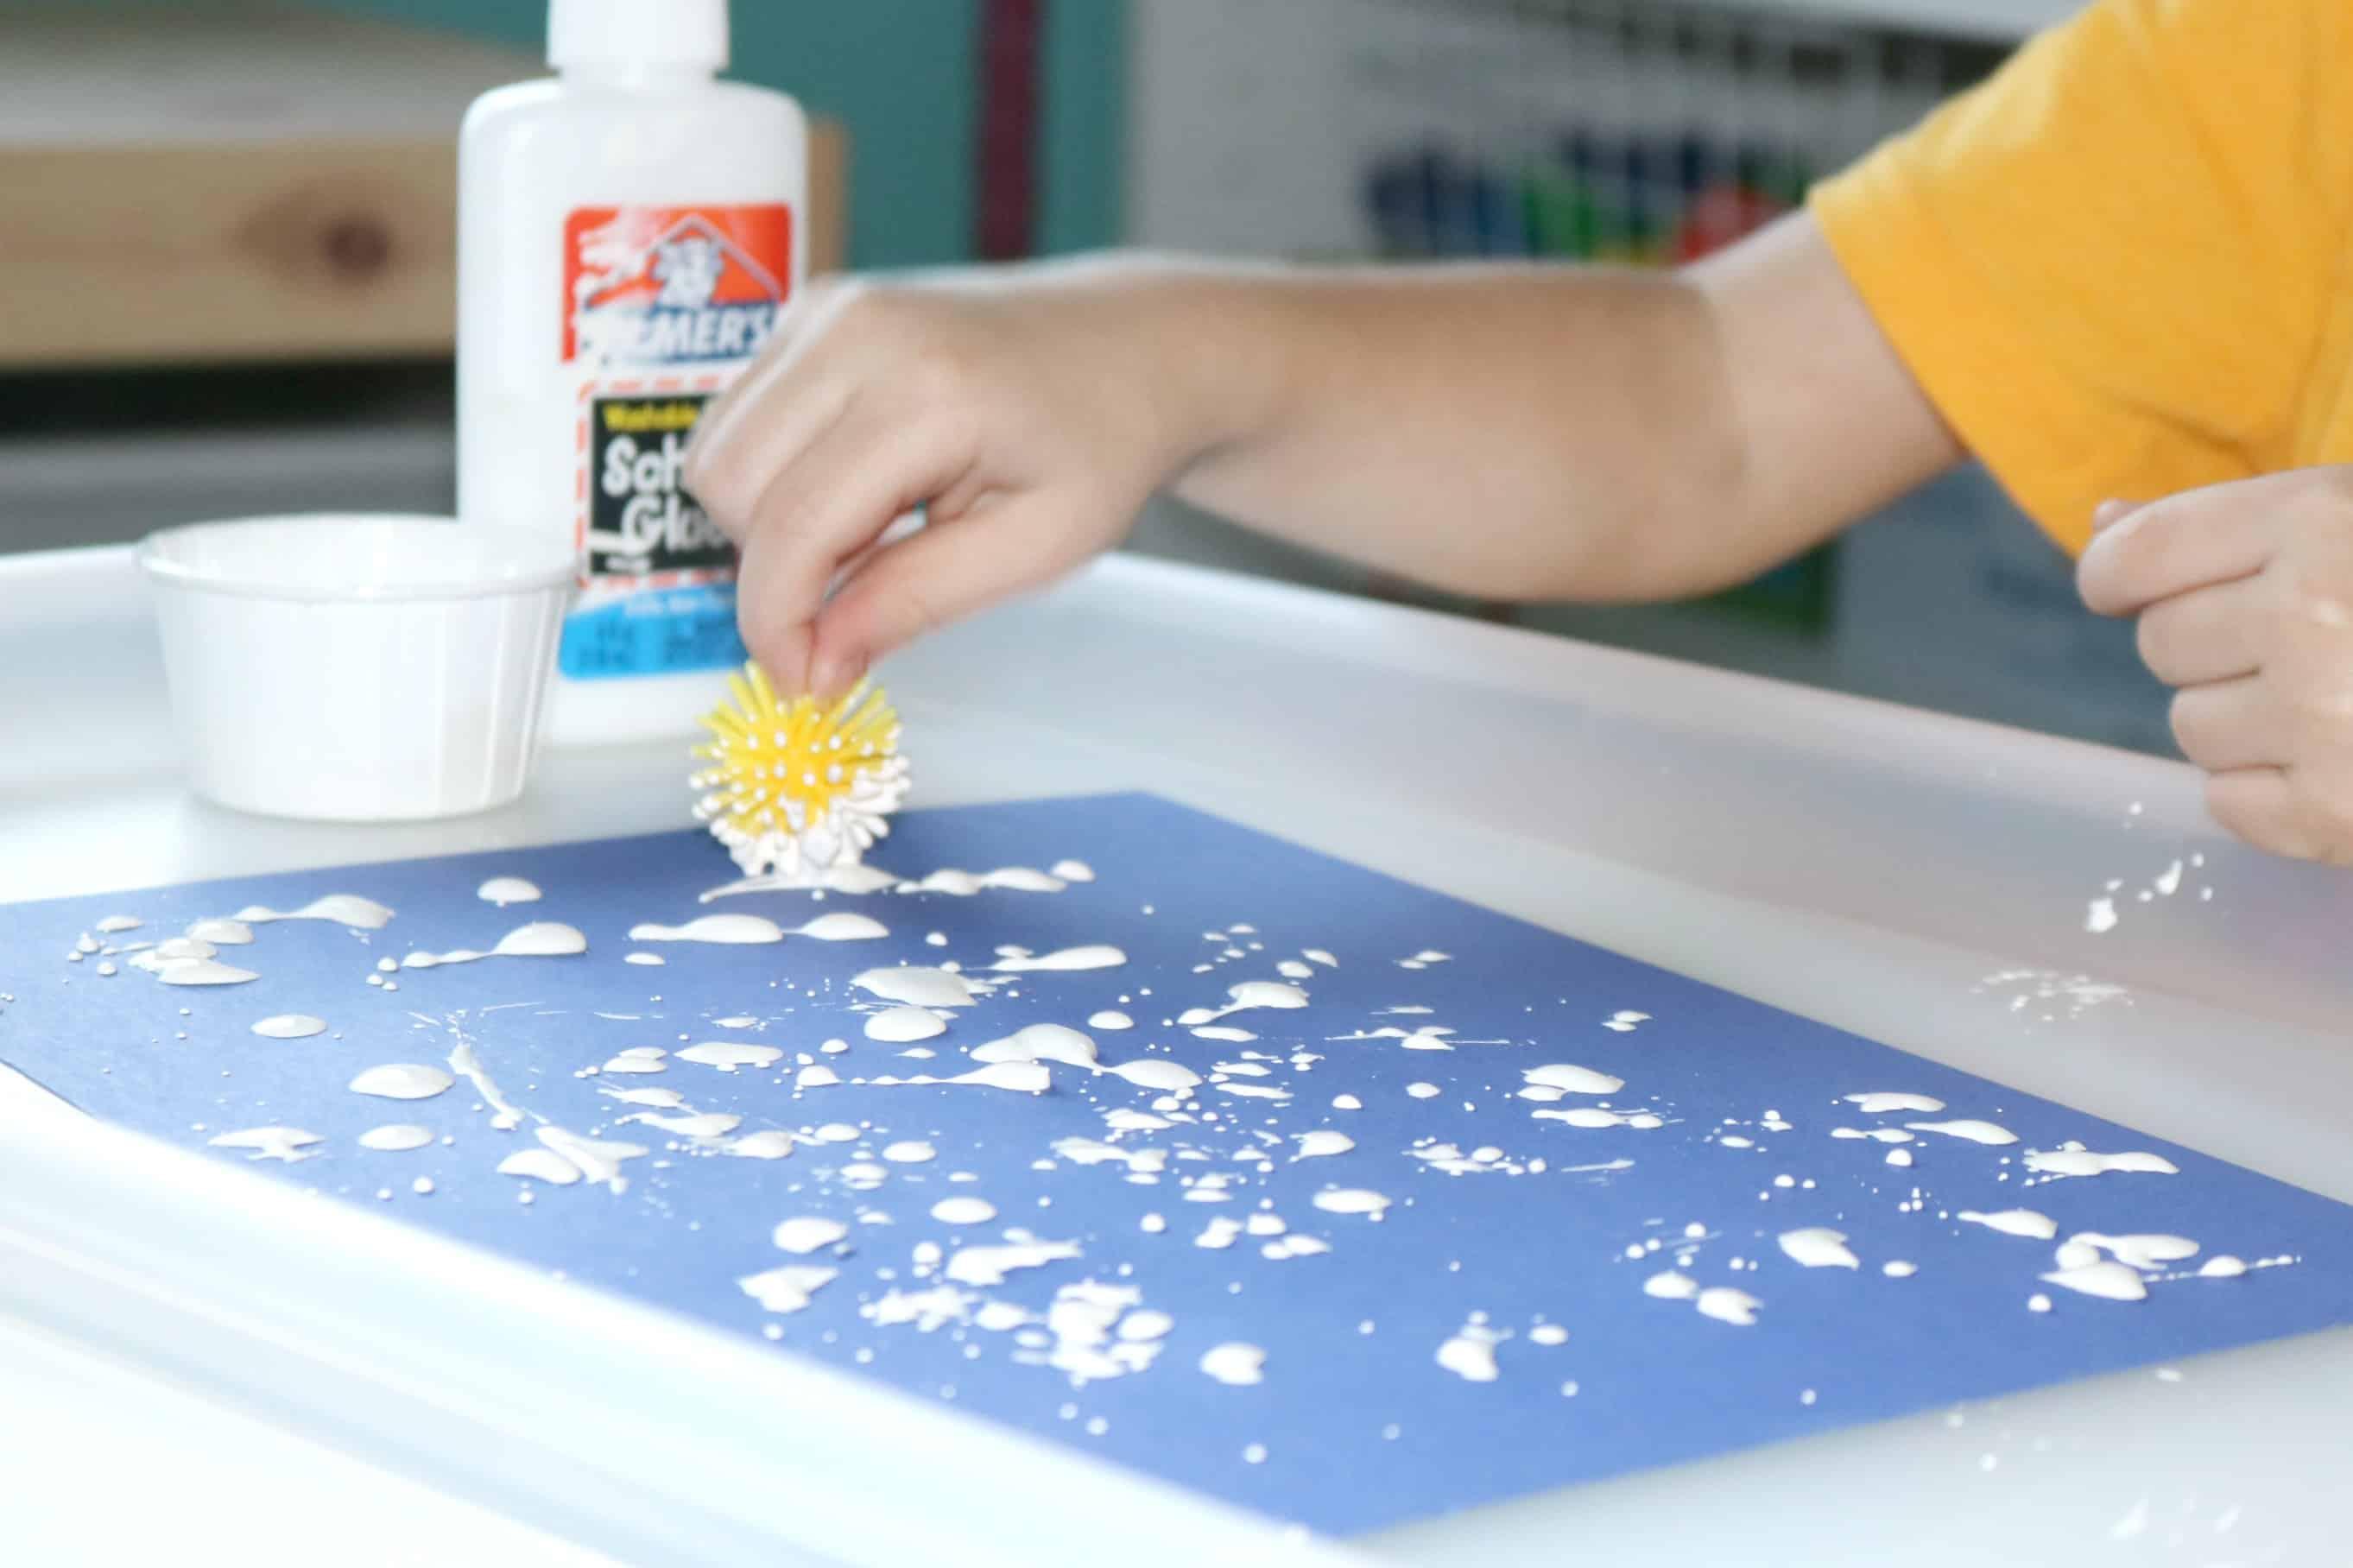 Dandelion Invitation to Create Flower Art